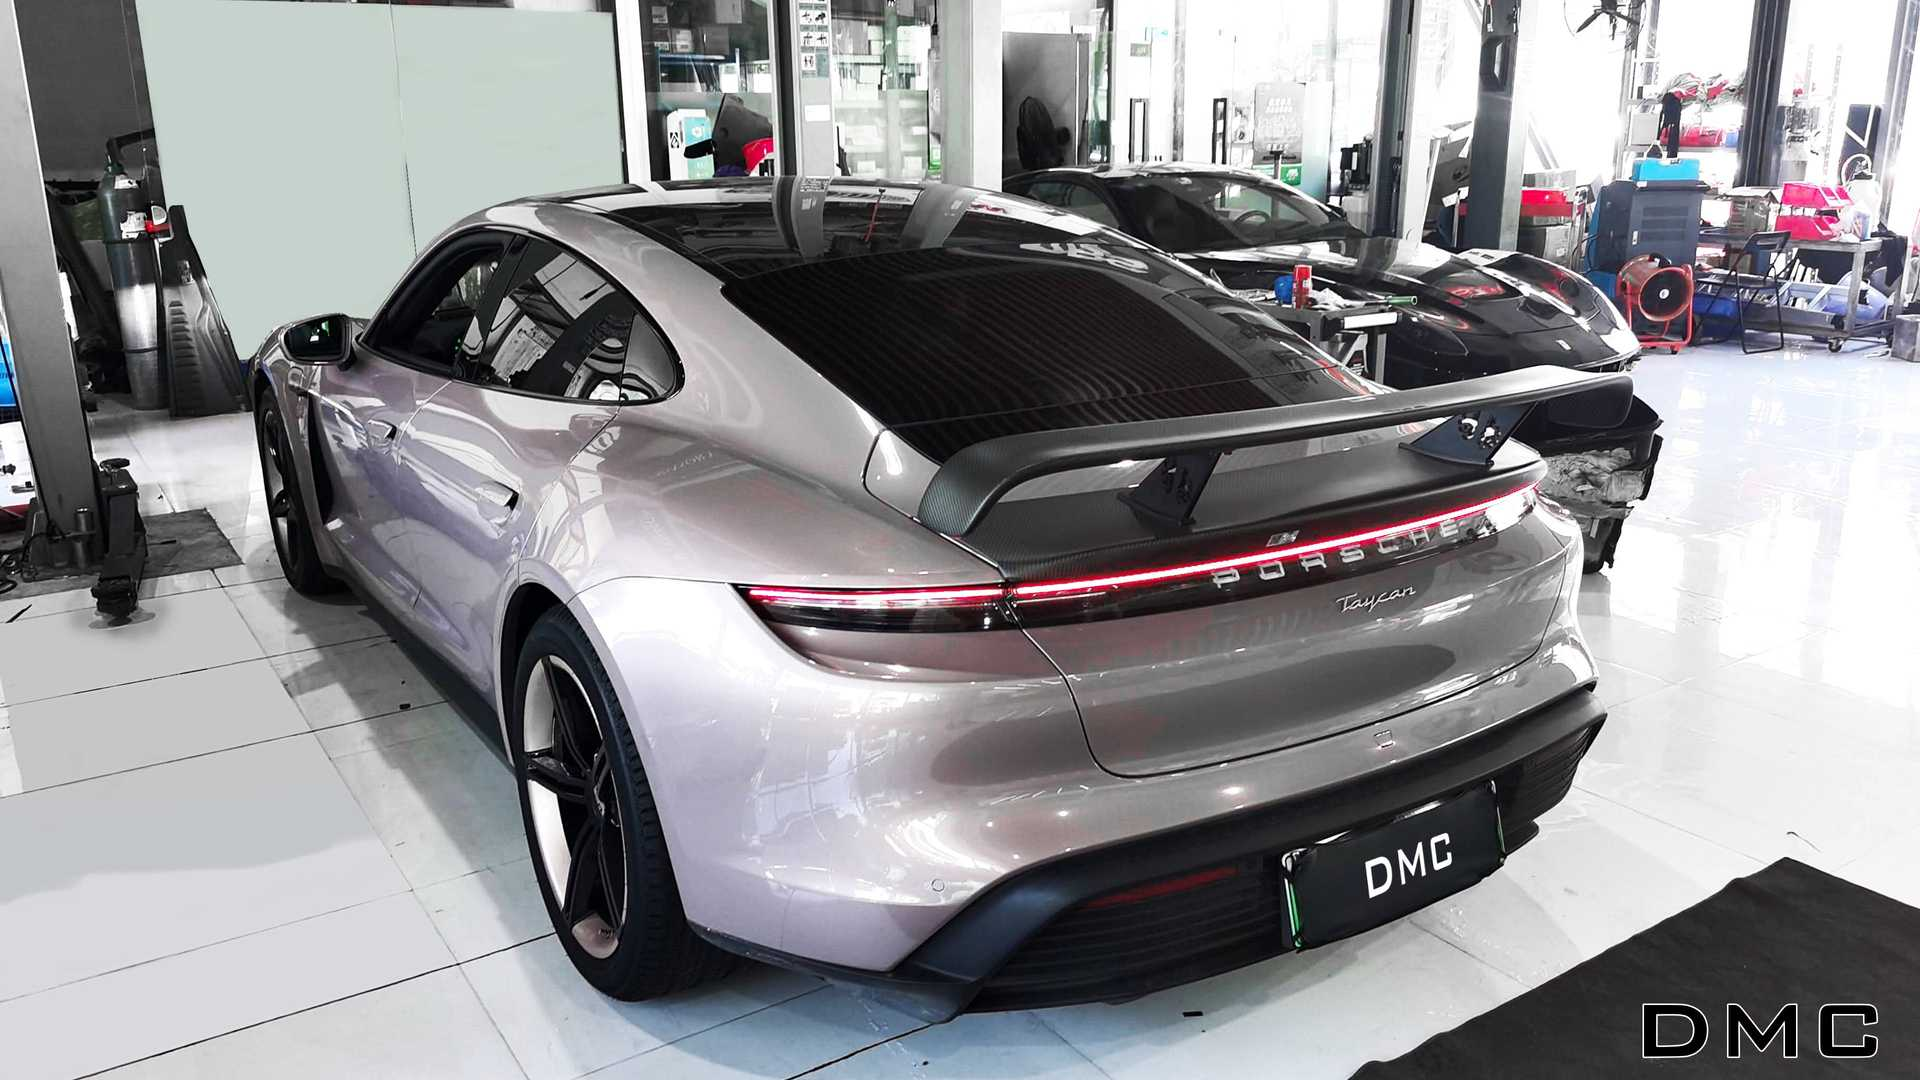 https://cdn.motor1.com/images/mgl/LewKj/s6/kit-aerodinamico-dmc-per-porsche-taycan.jpg